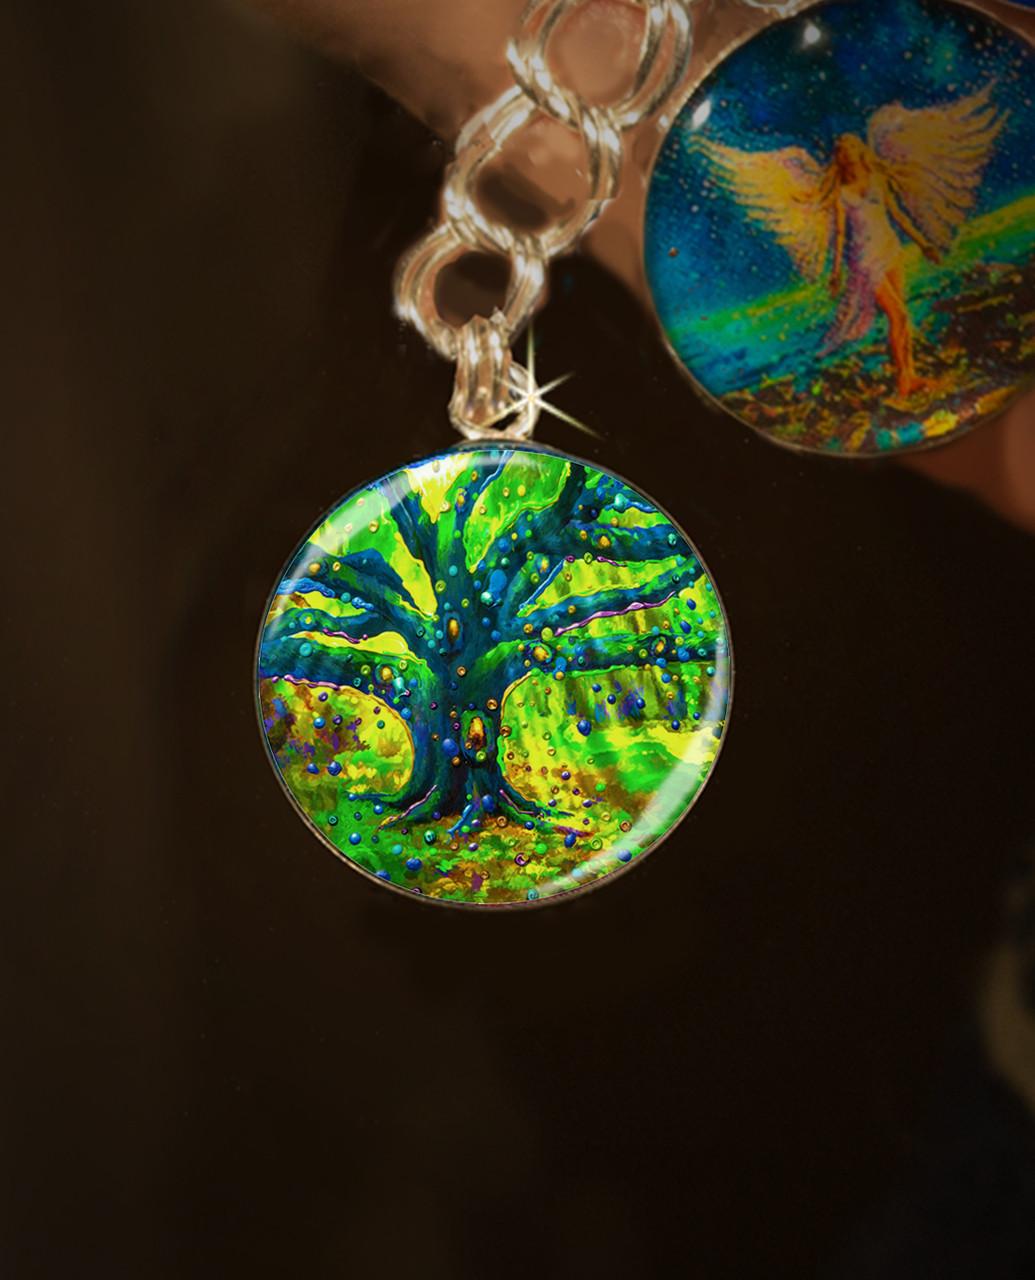 The Fairy Tree - Magical Good Luck Charm